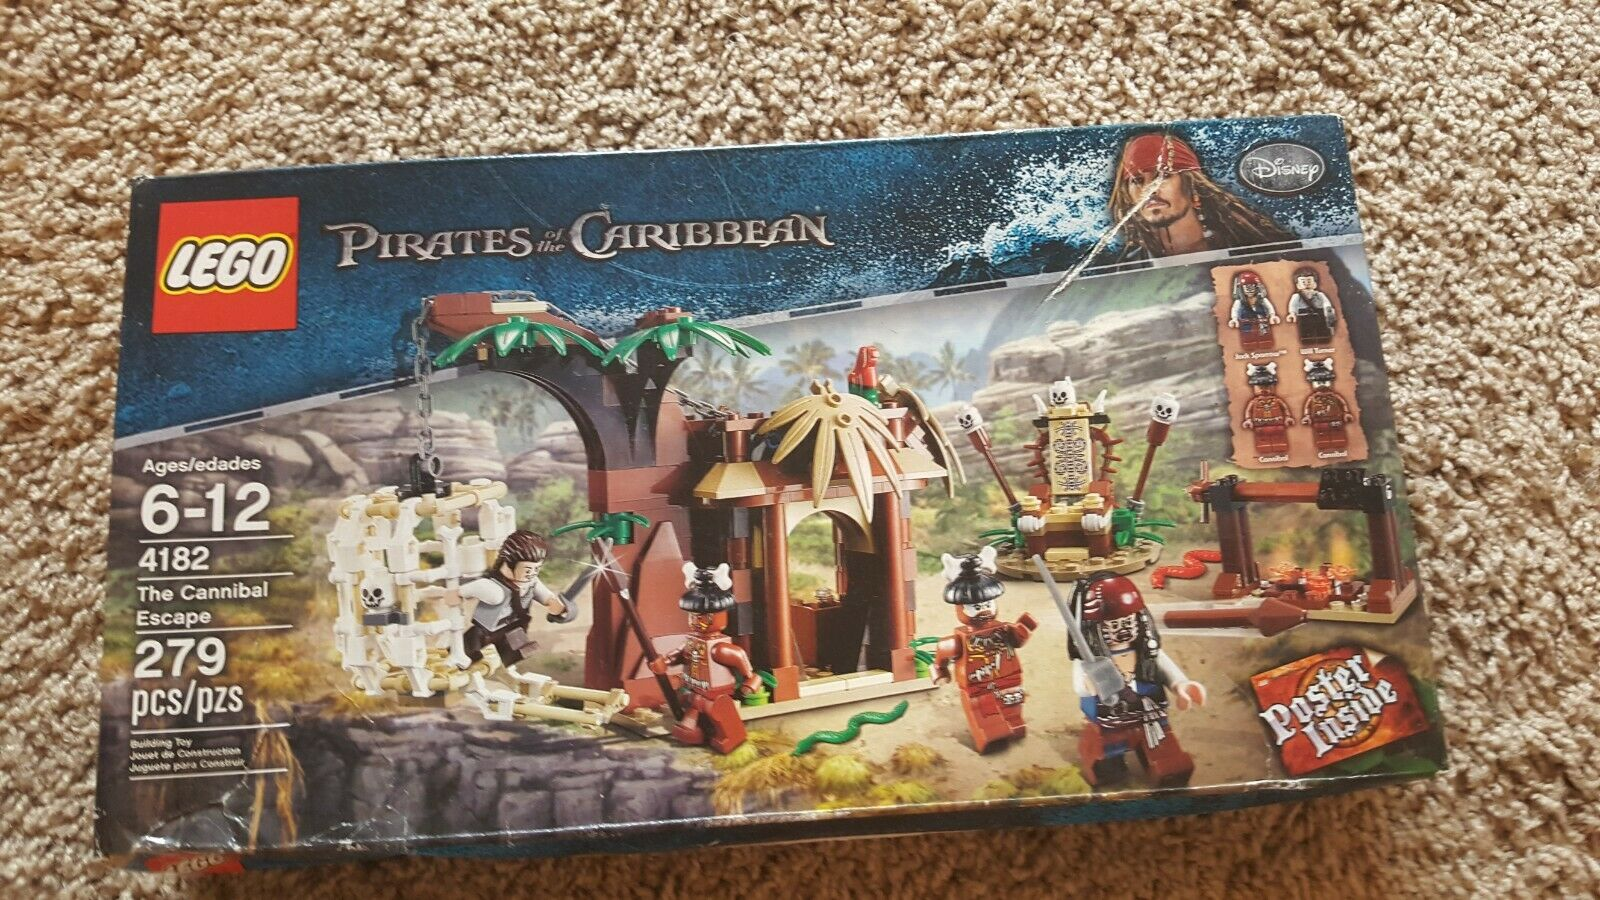 LEGO  Pirates Of The autoibbean Cannibal Escape  4182 (scatola SLIGHTLY DAMAGED)  acquistare ora